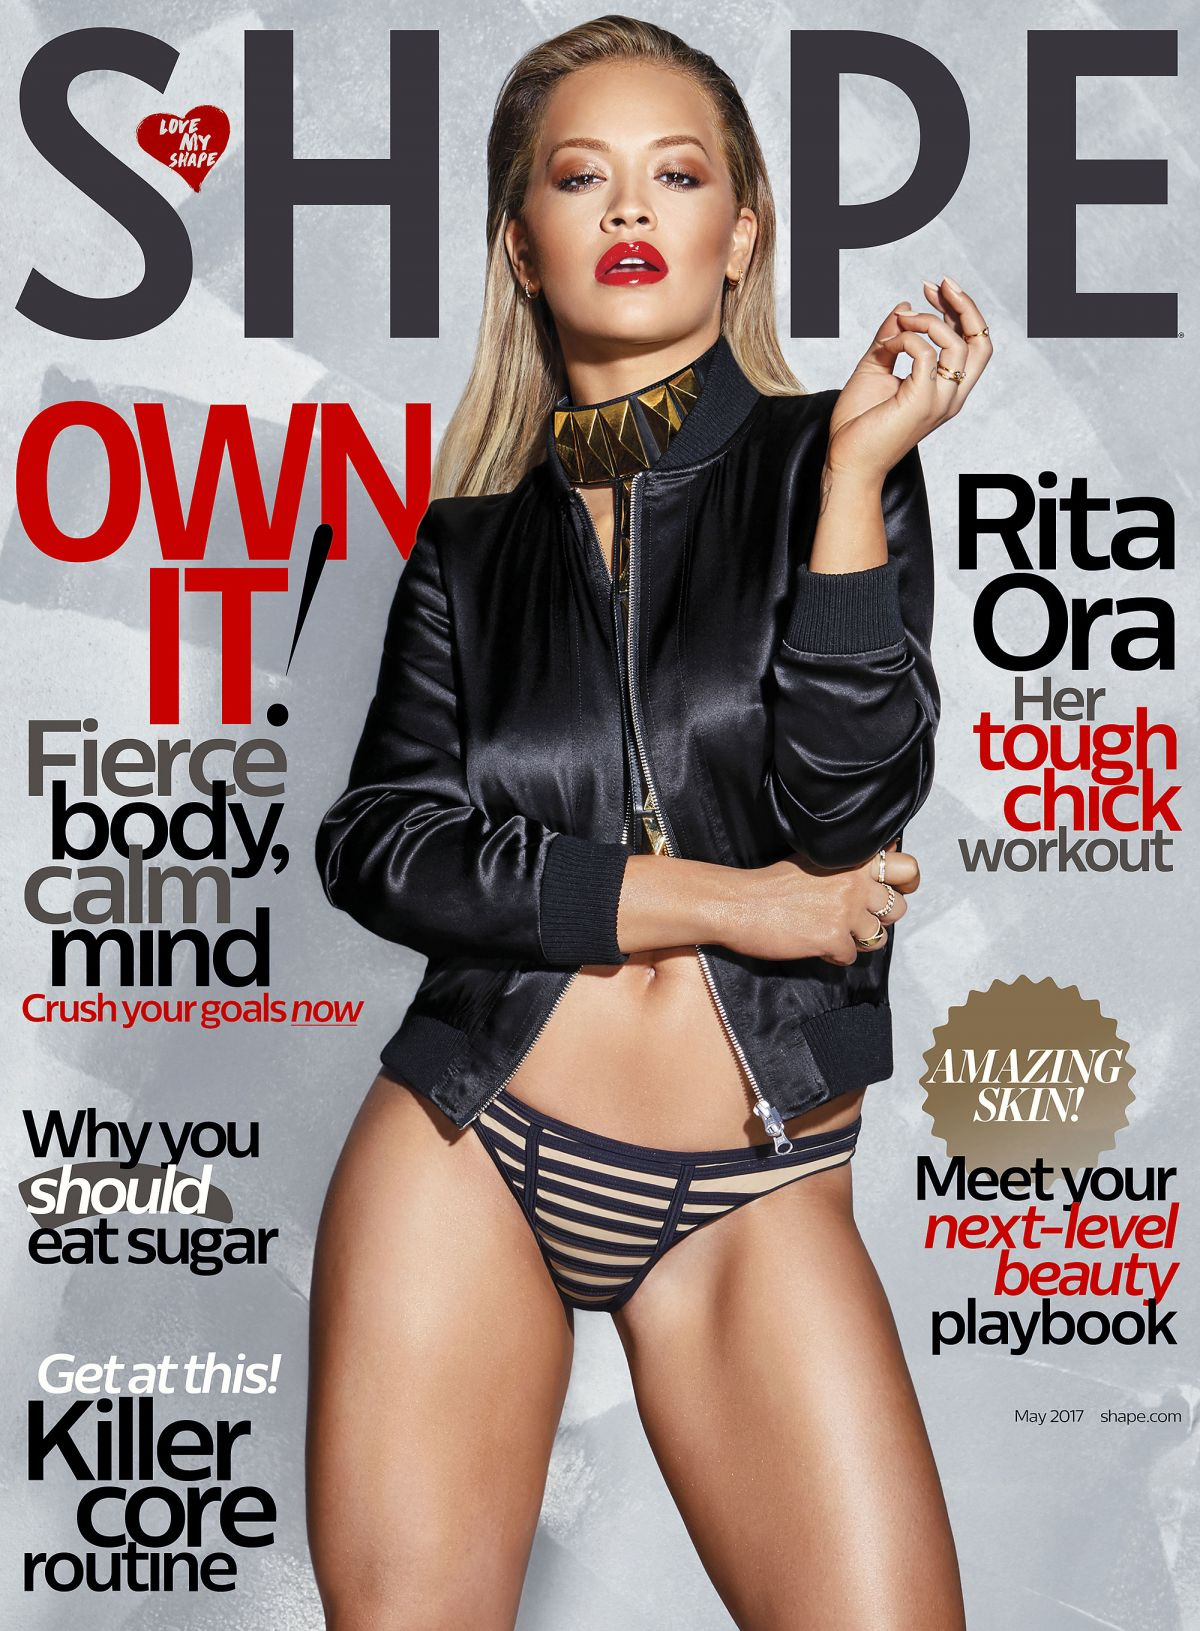 RITA ORA in Shape Magazine, May 2017 Issue